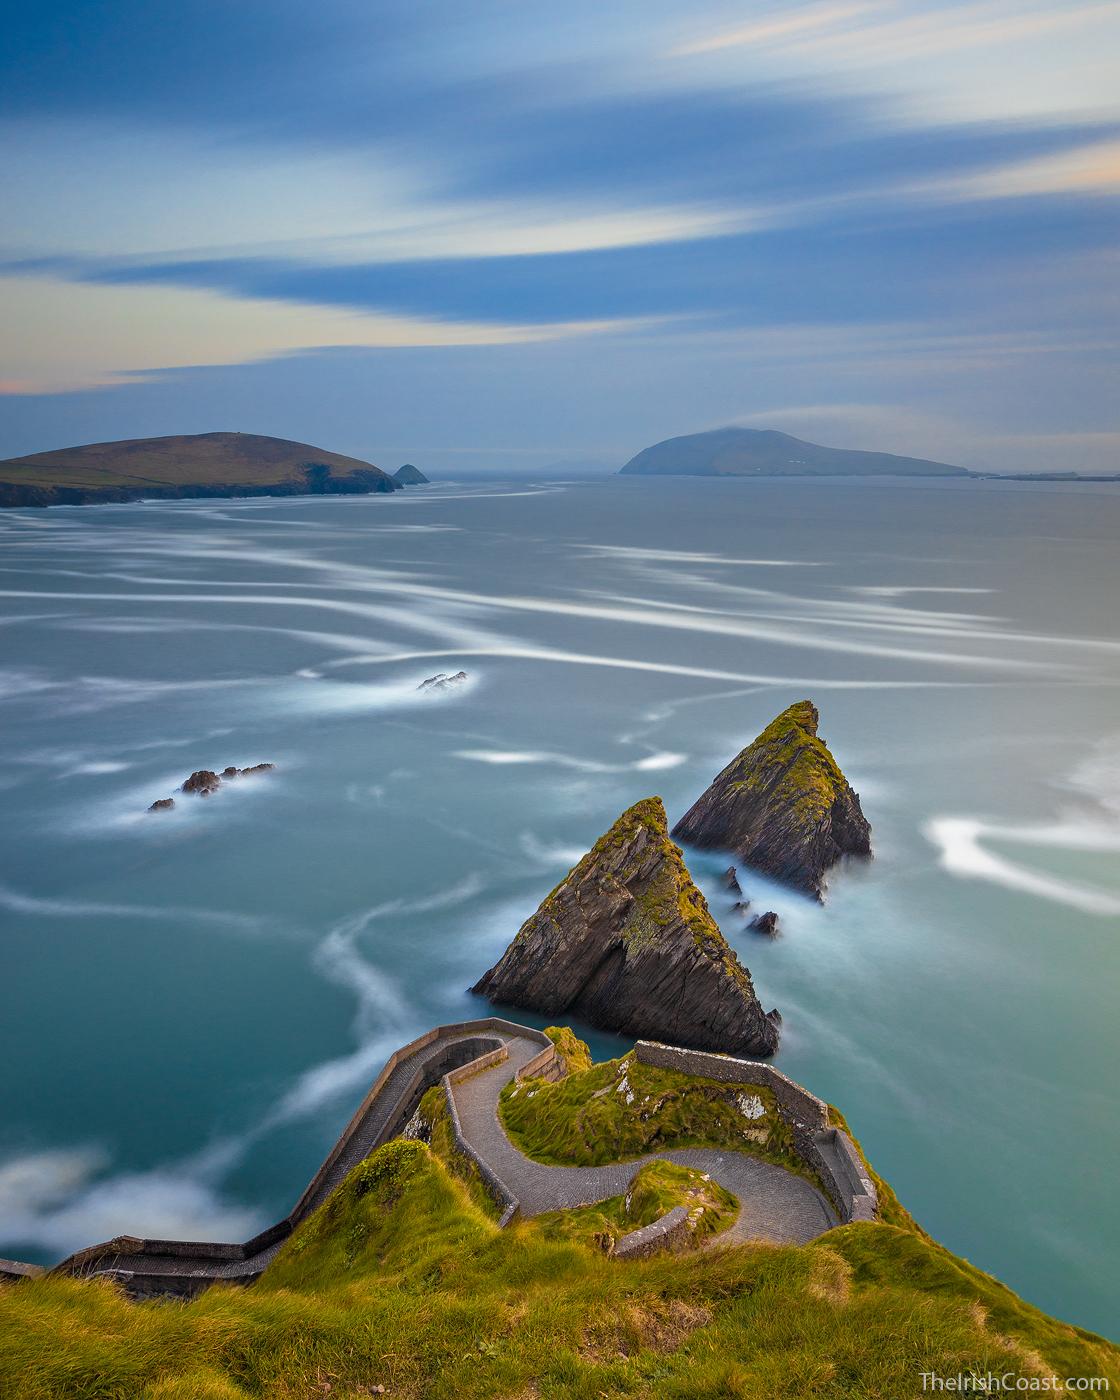 Dunquin Harbour, County Kerry, Ireland